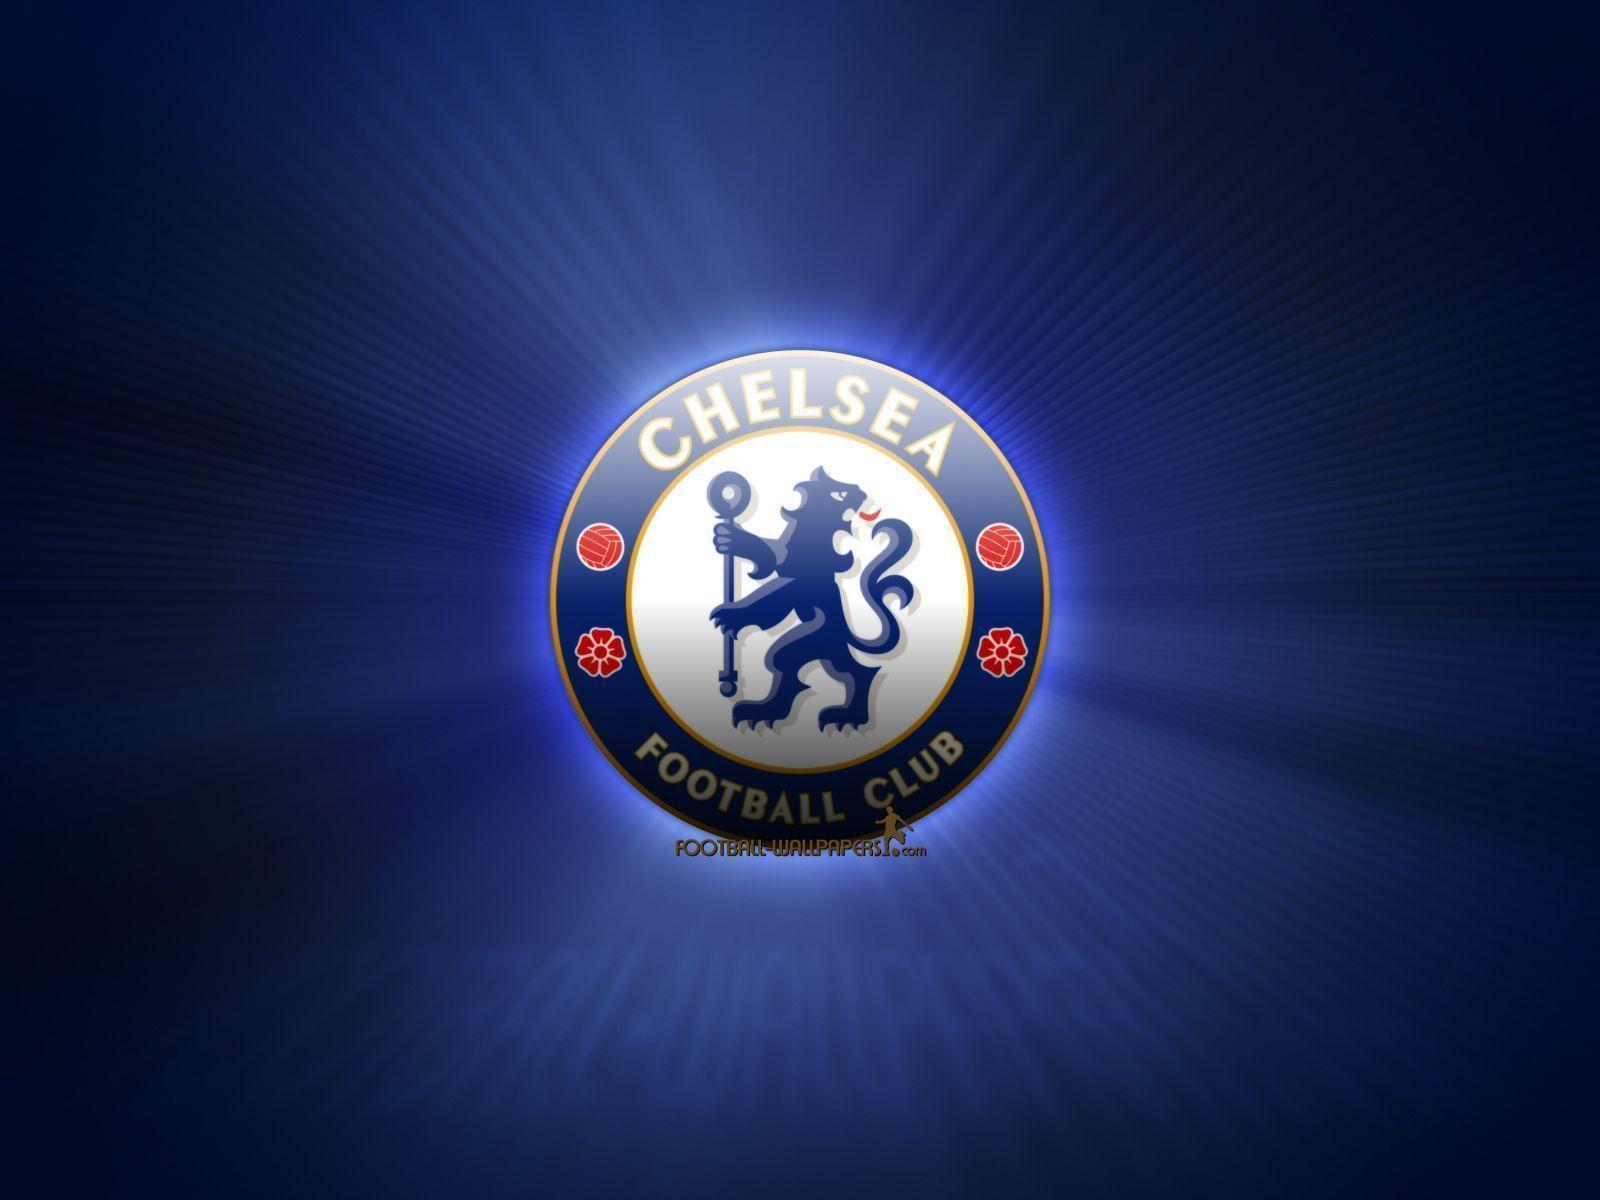 Chelsea Logo Wallpapers - Wallpaper Cave 61308d989